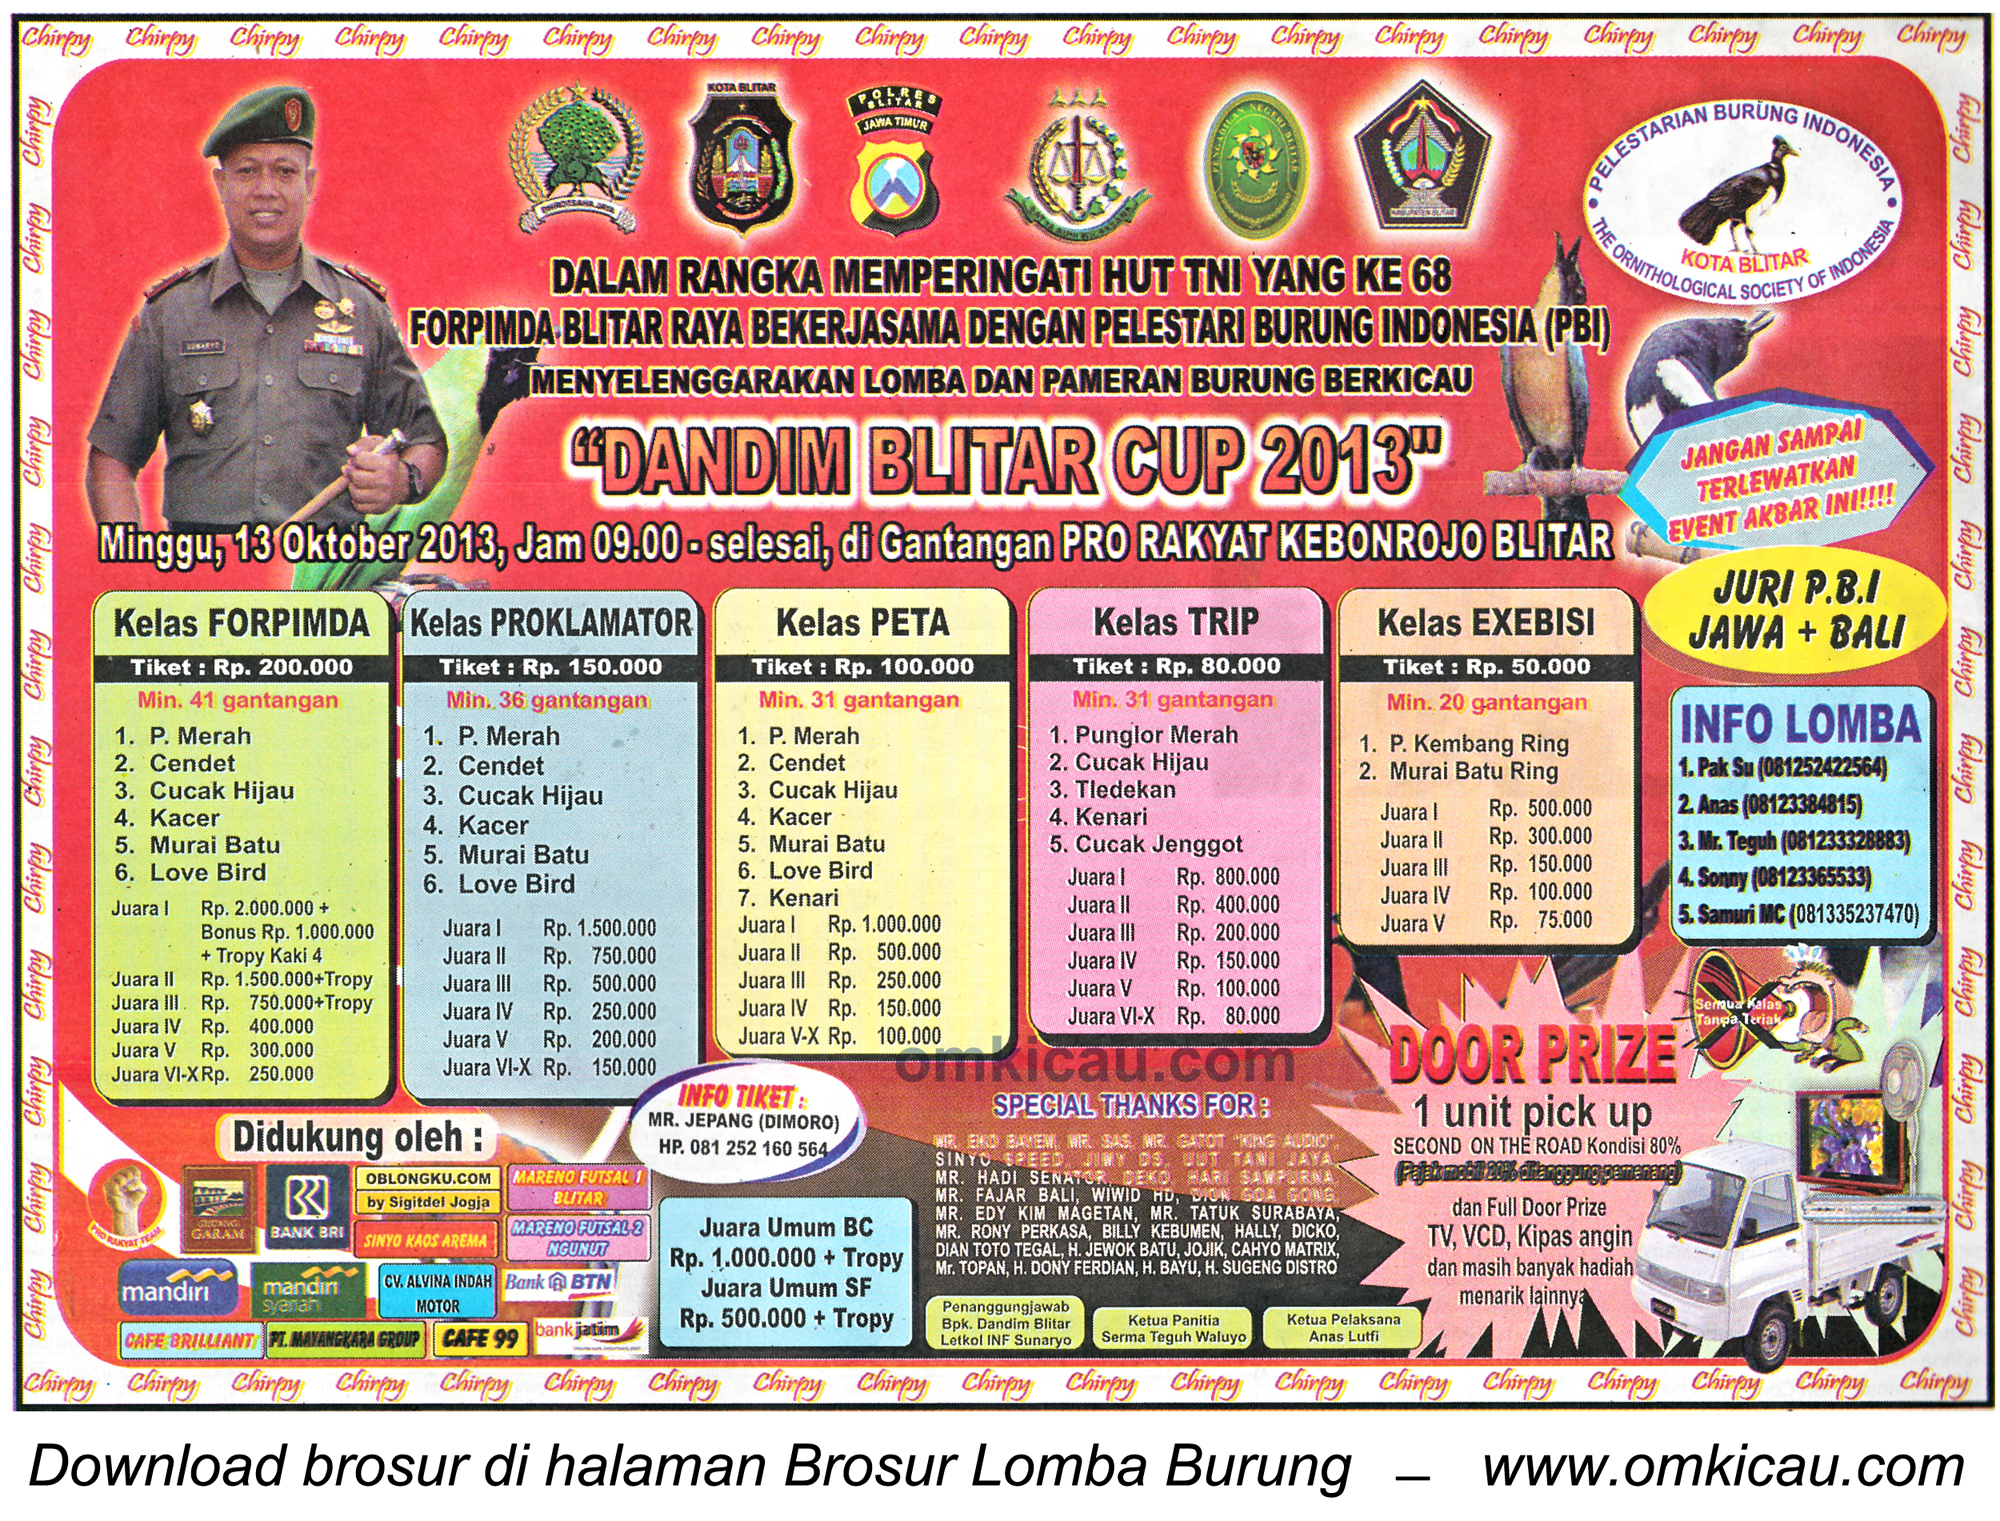 Brosur Lomba Burung Berkicau Dandim Blitar Cup 13 Okt 2013